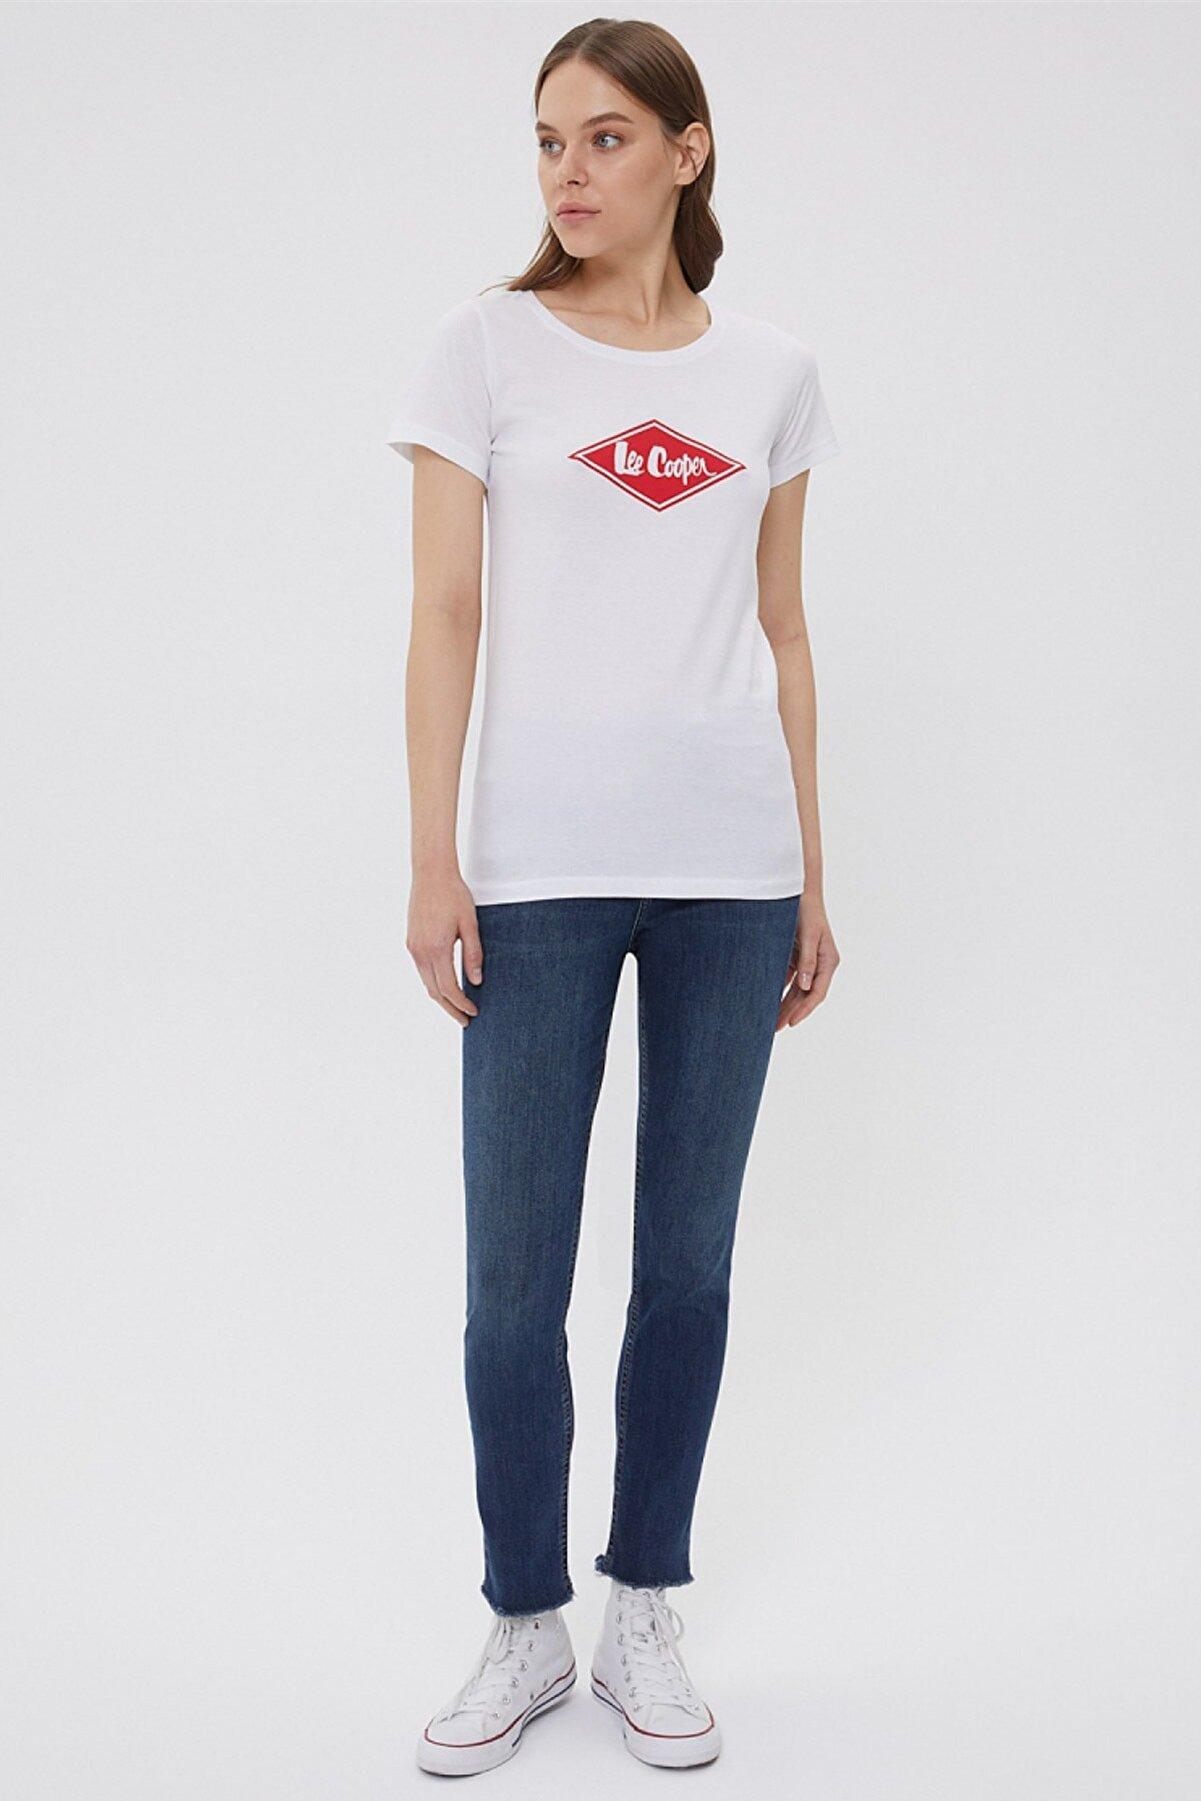 Lee Cooper Kadın Jade O Yaka T-Shirt Beyaz 202 LCF 242012